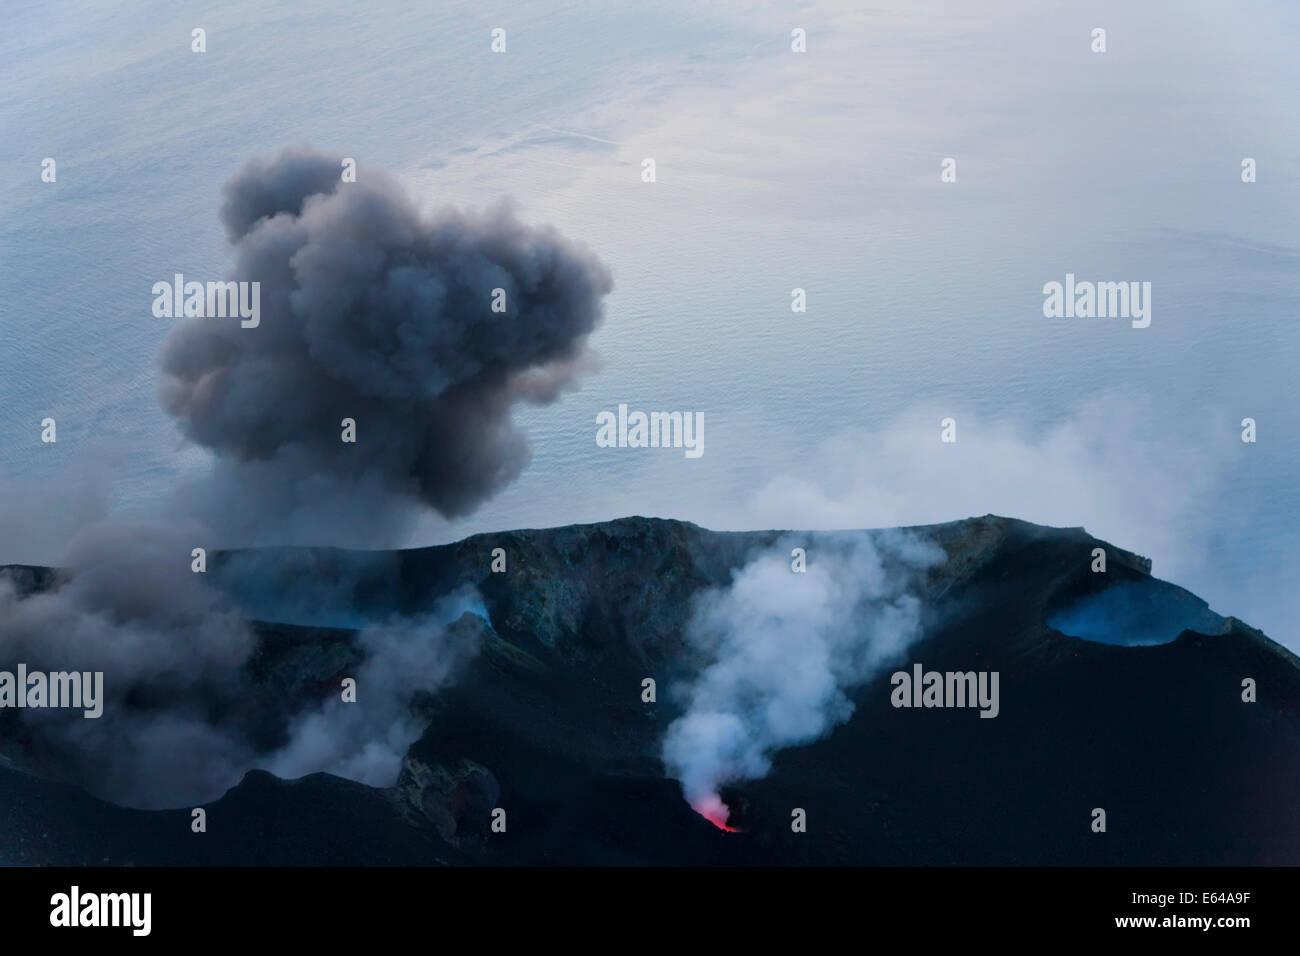 Vulkanausbruch mit schwarzem Rauch, Vulkan Stromboli, Insel Stromboli, Äolischen Inseln, Sizilien, Süditalien, Stockbild